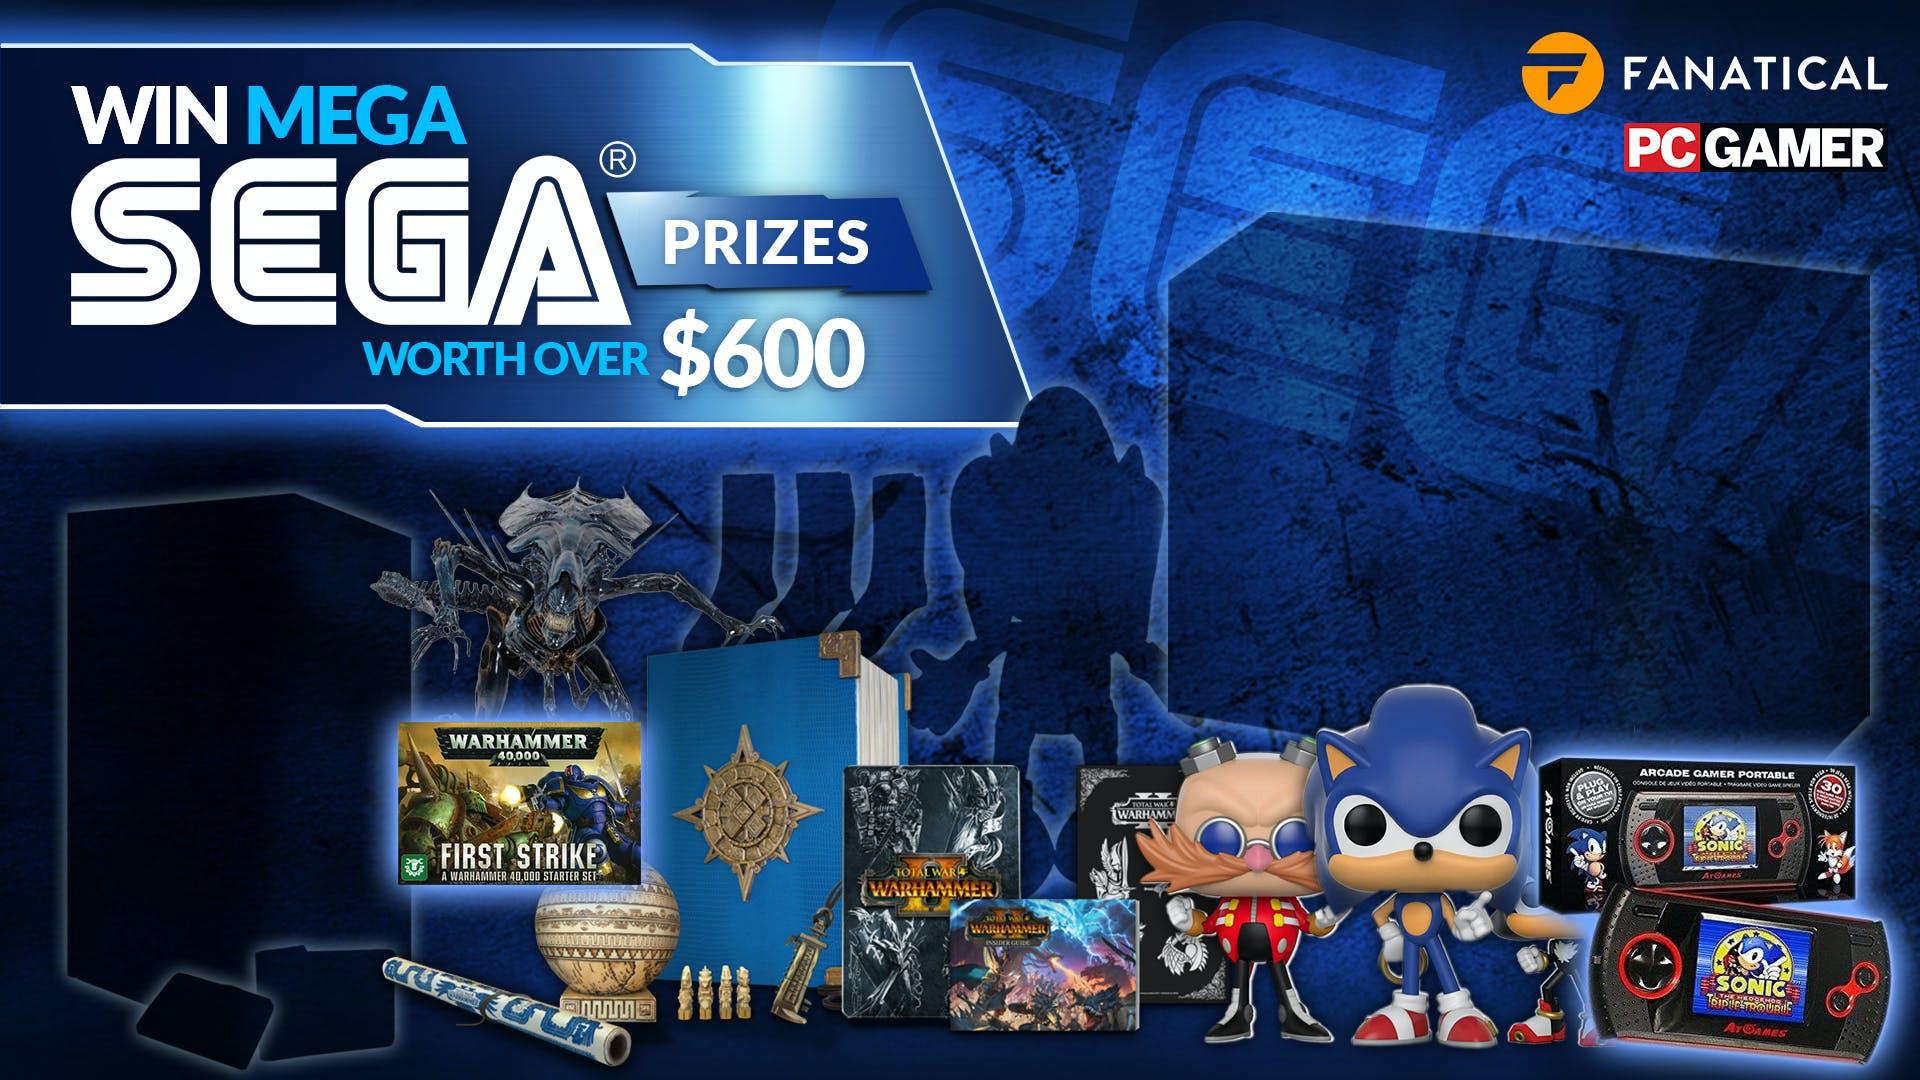 https://images.prismic.io/fanatical/835e422cda762c4a447c76cde7e4038bf3209de5_sega-contest-cover-prizes-day04.jpg?auto=compress,format